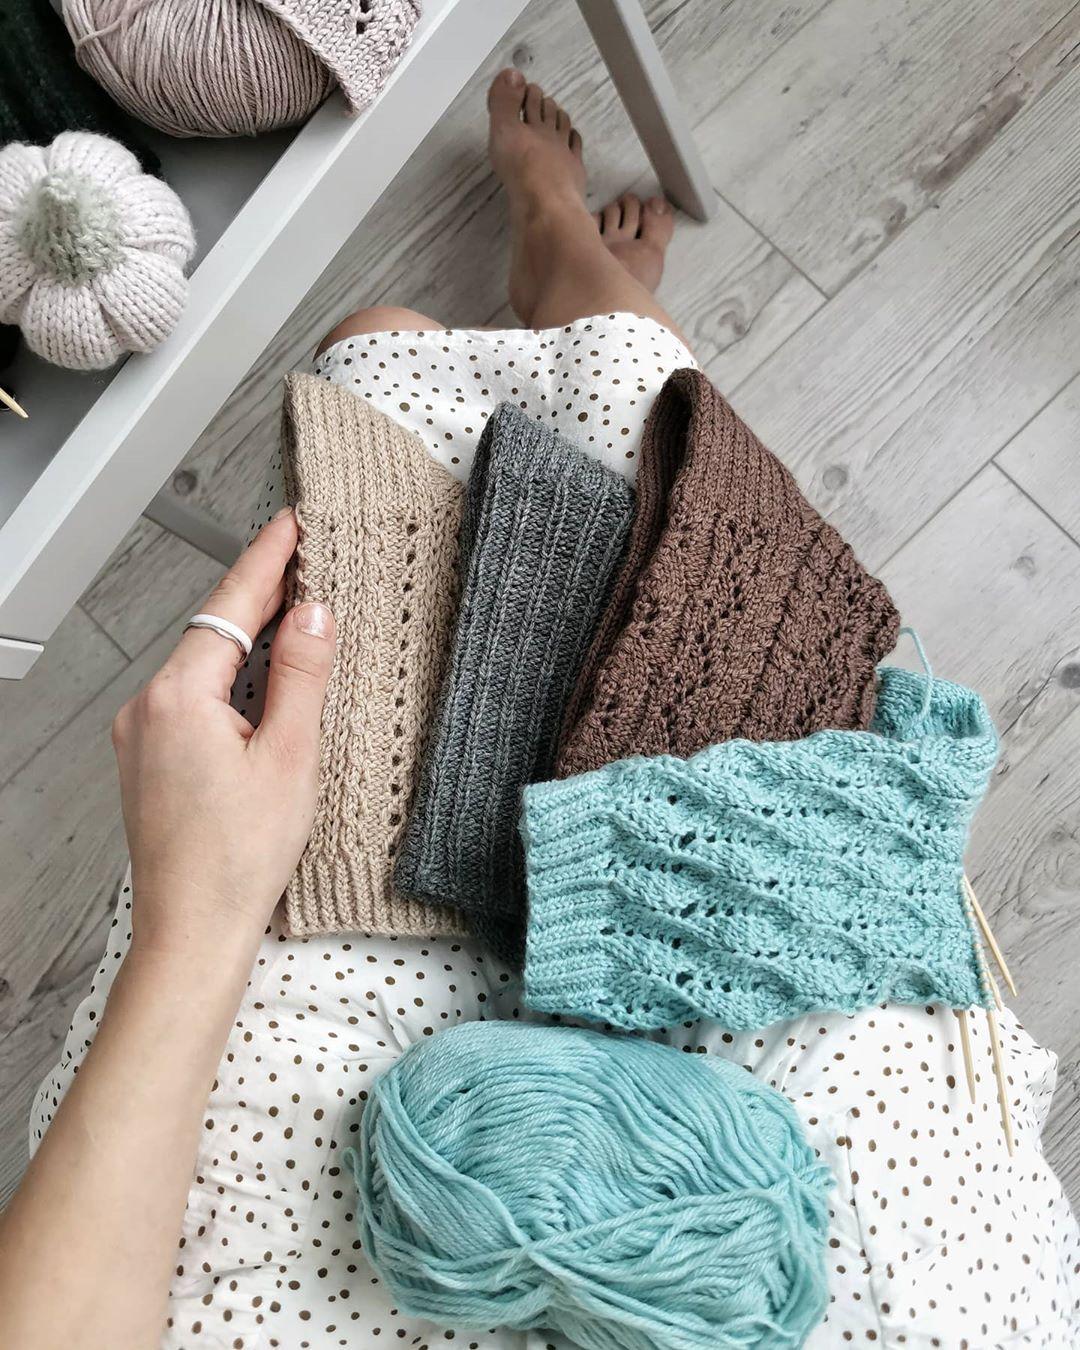 Знакомьтесь: Один Из Будущей Парочки Tr Вязаниетюмень - Knitting Socks